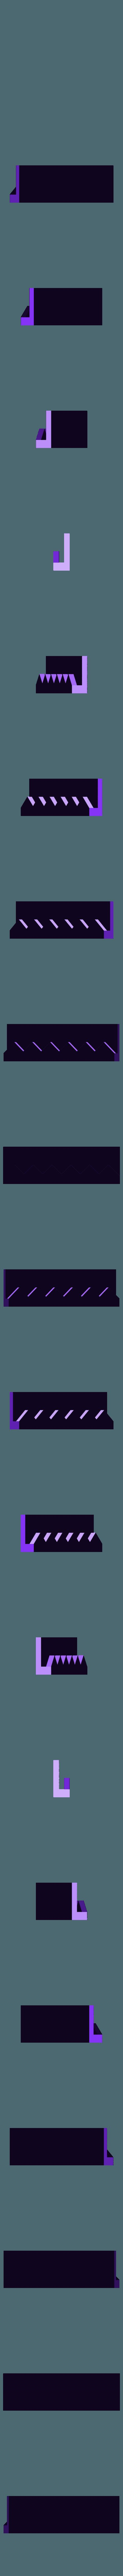 Hanger_flat.stl Download free STL file Dark Side of the Moon - Pink Floyd • Object to 3D print, JayOmega